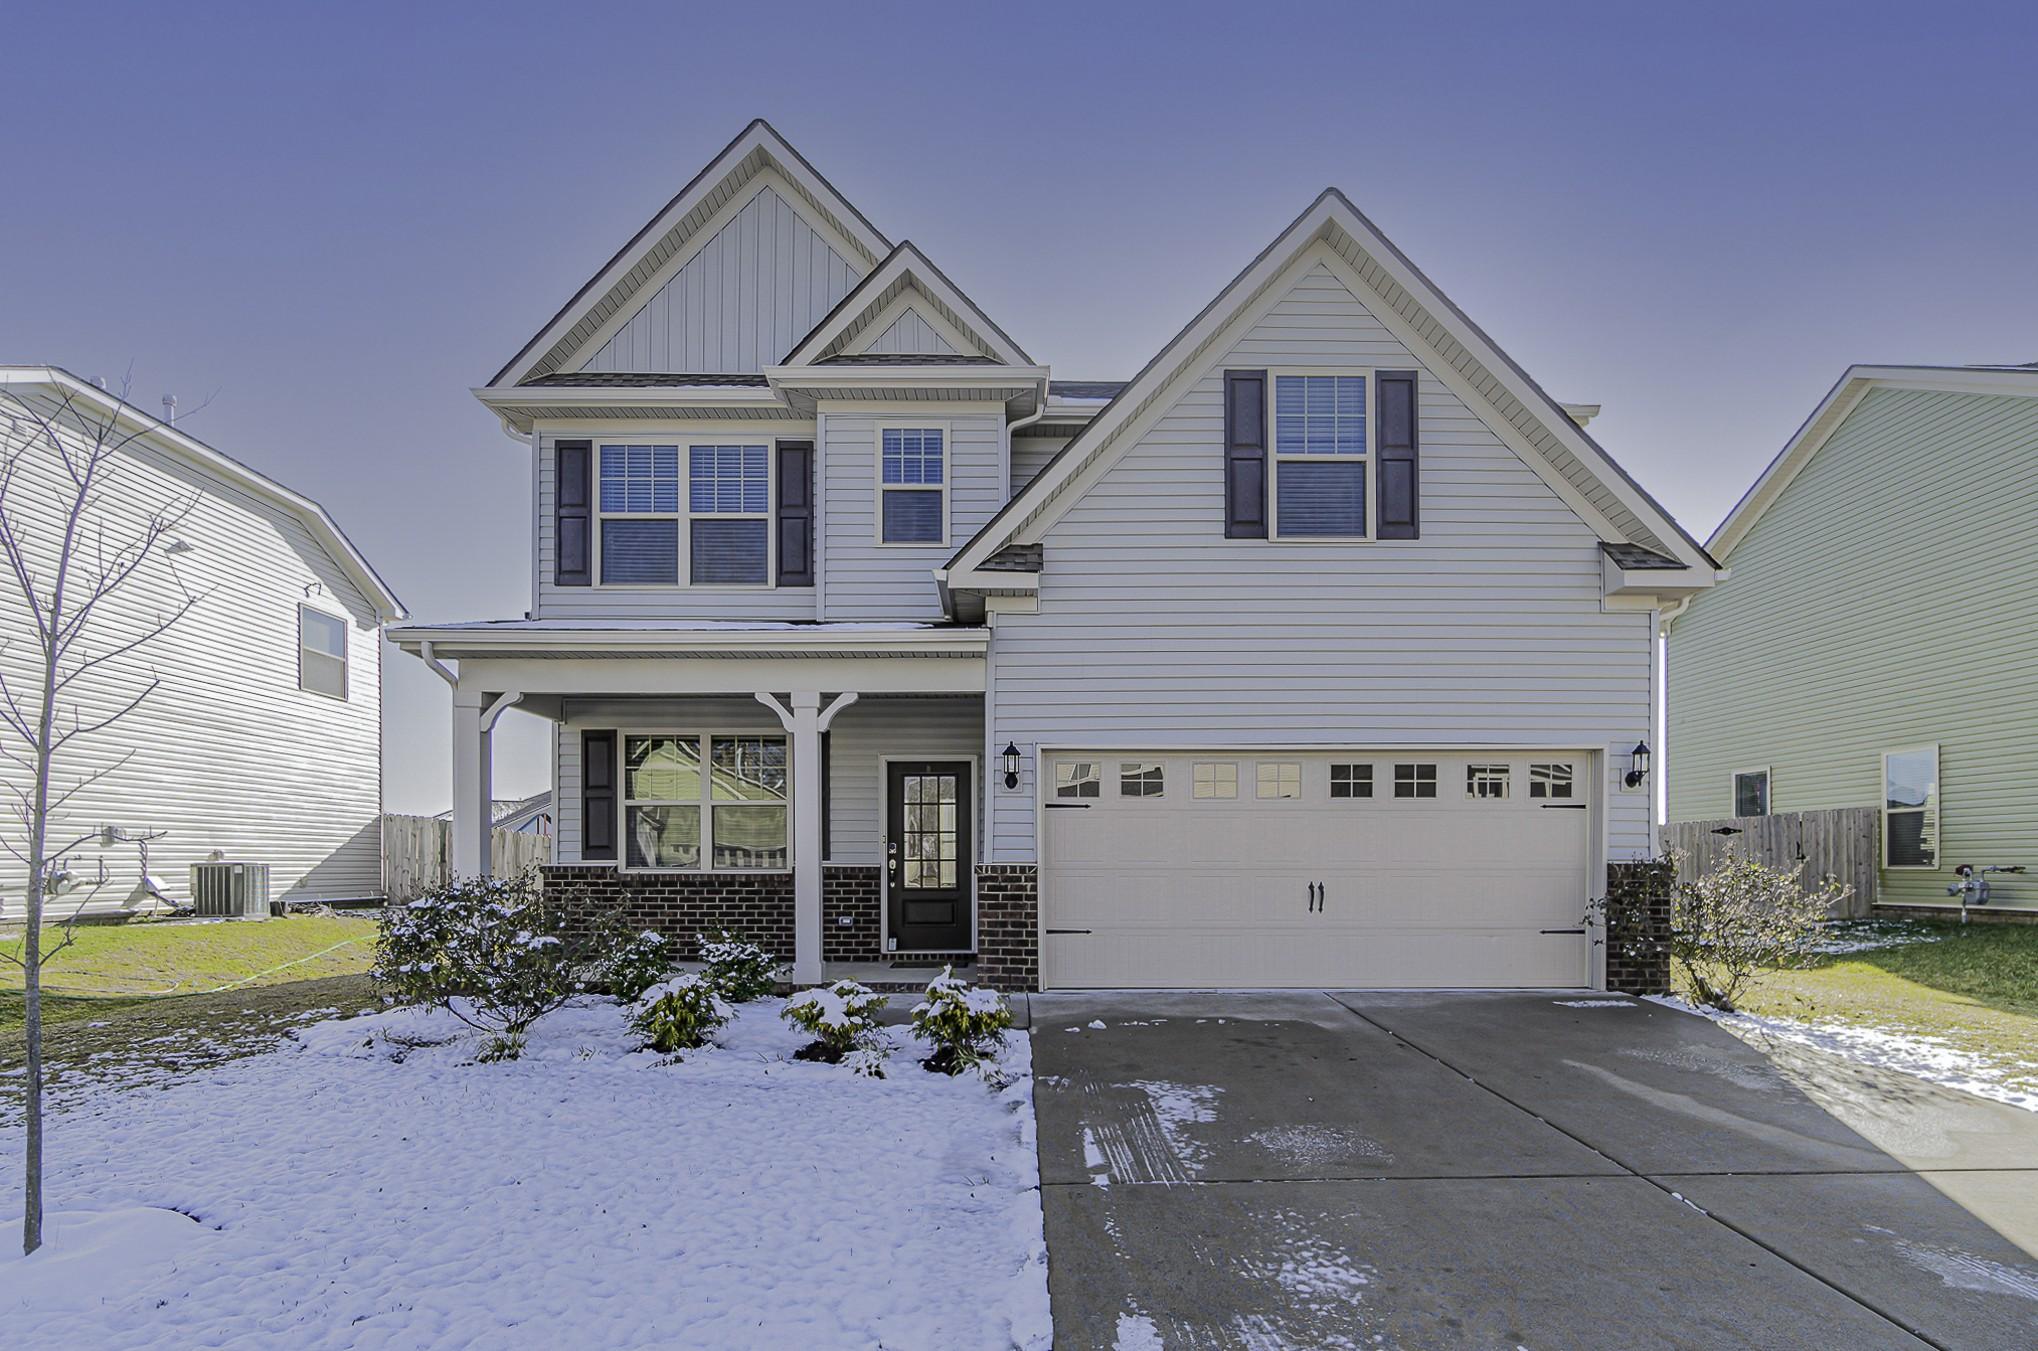 Abbington Downs Ph 1 Sec 2 Real Estate Listings Main Image